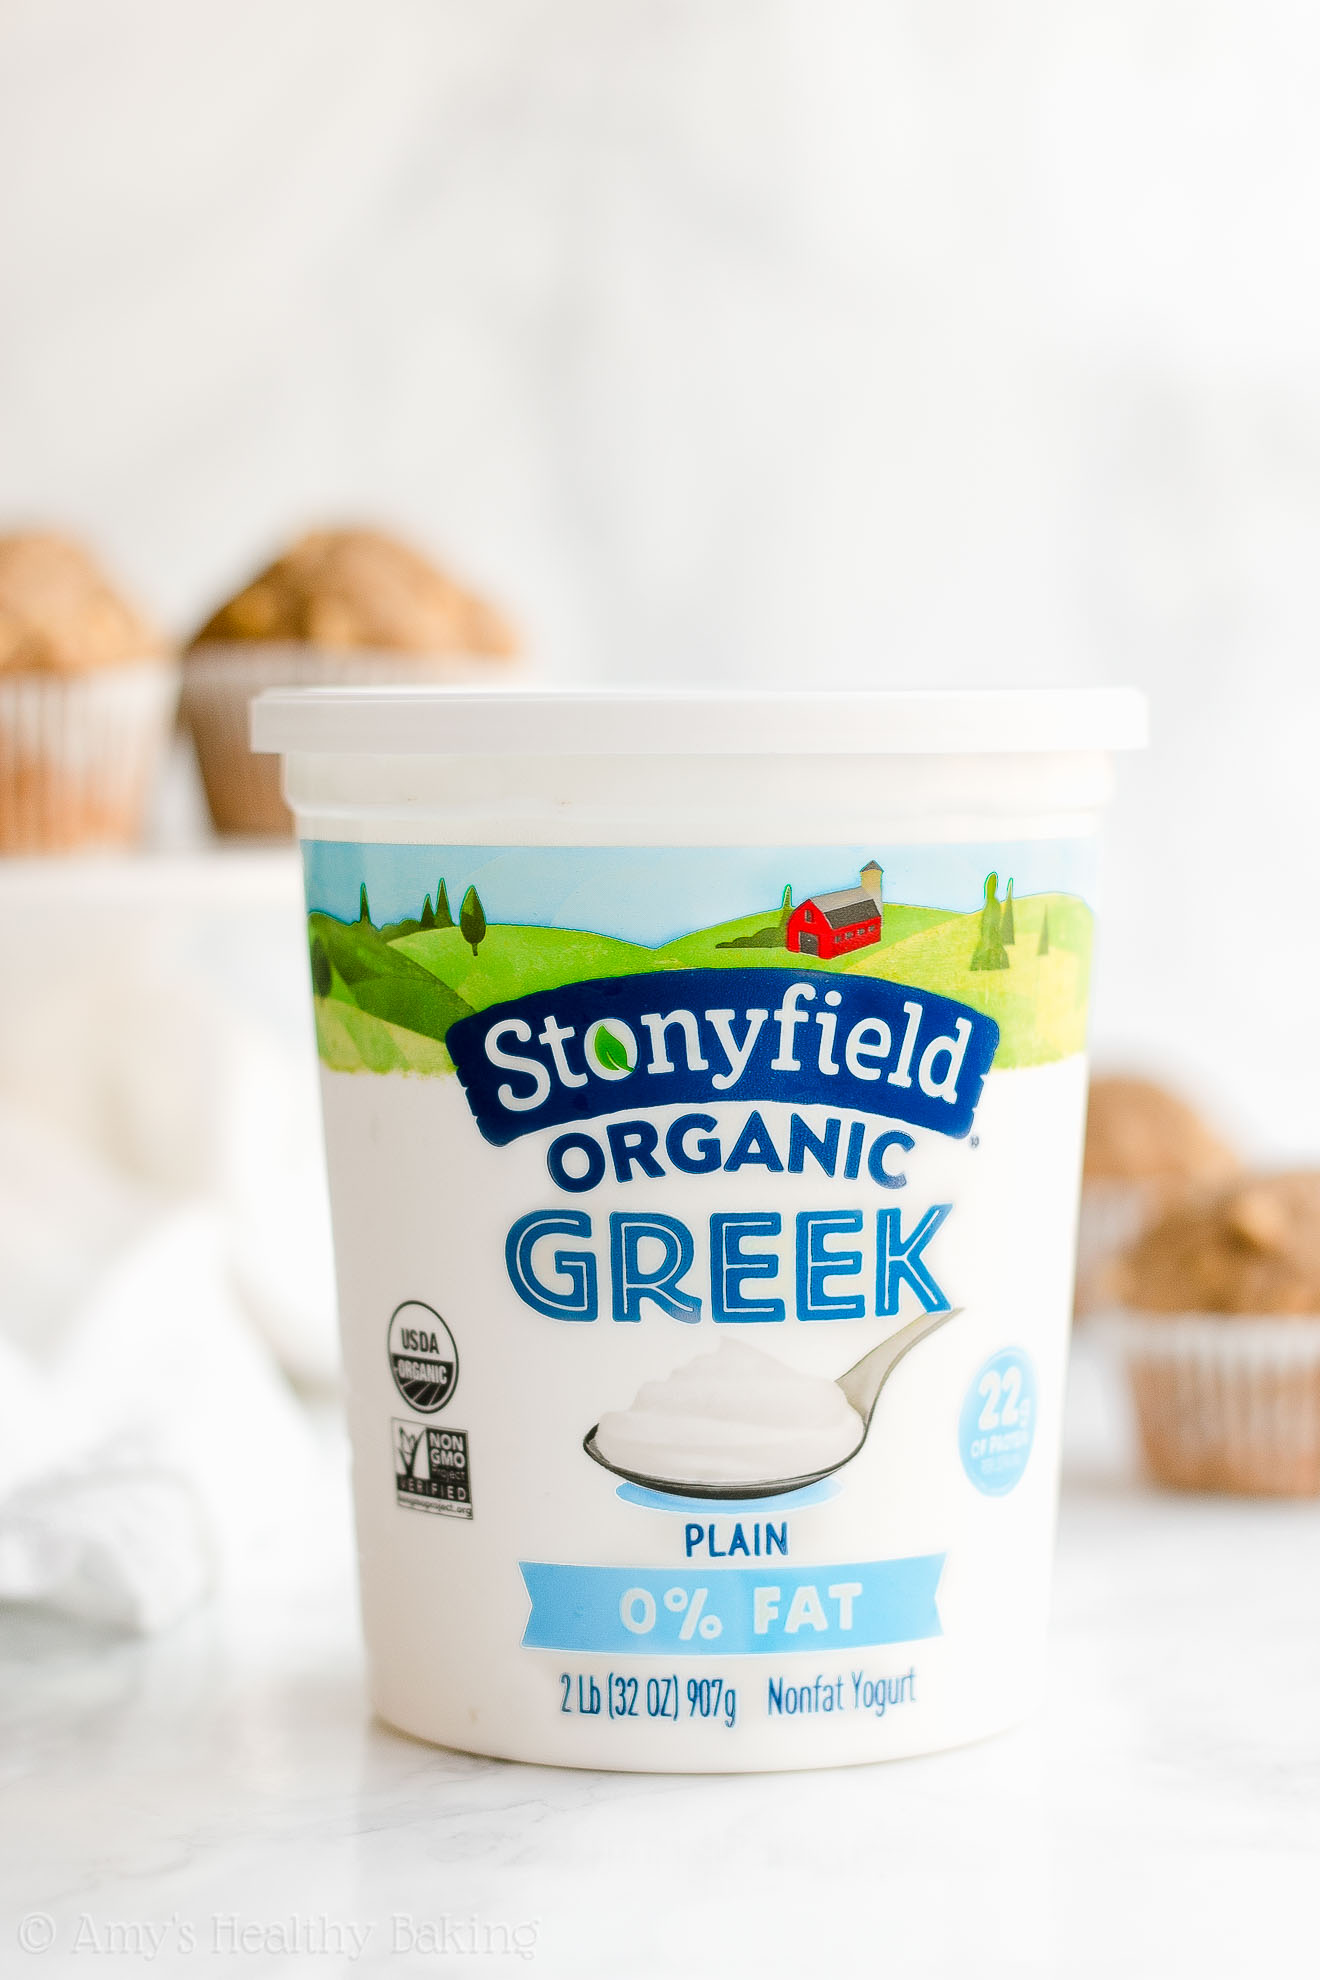 Stonyfield Organic Plain Nonfat Greek Yogurt, 32oz tub